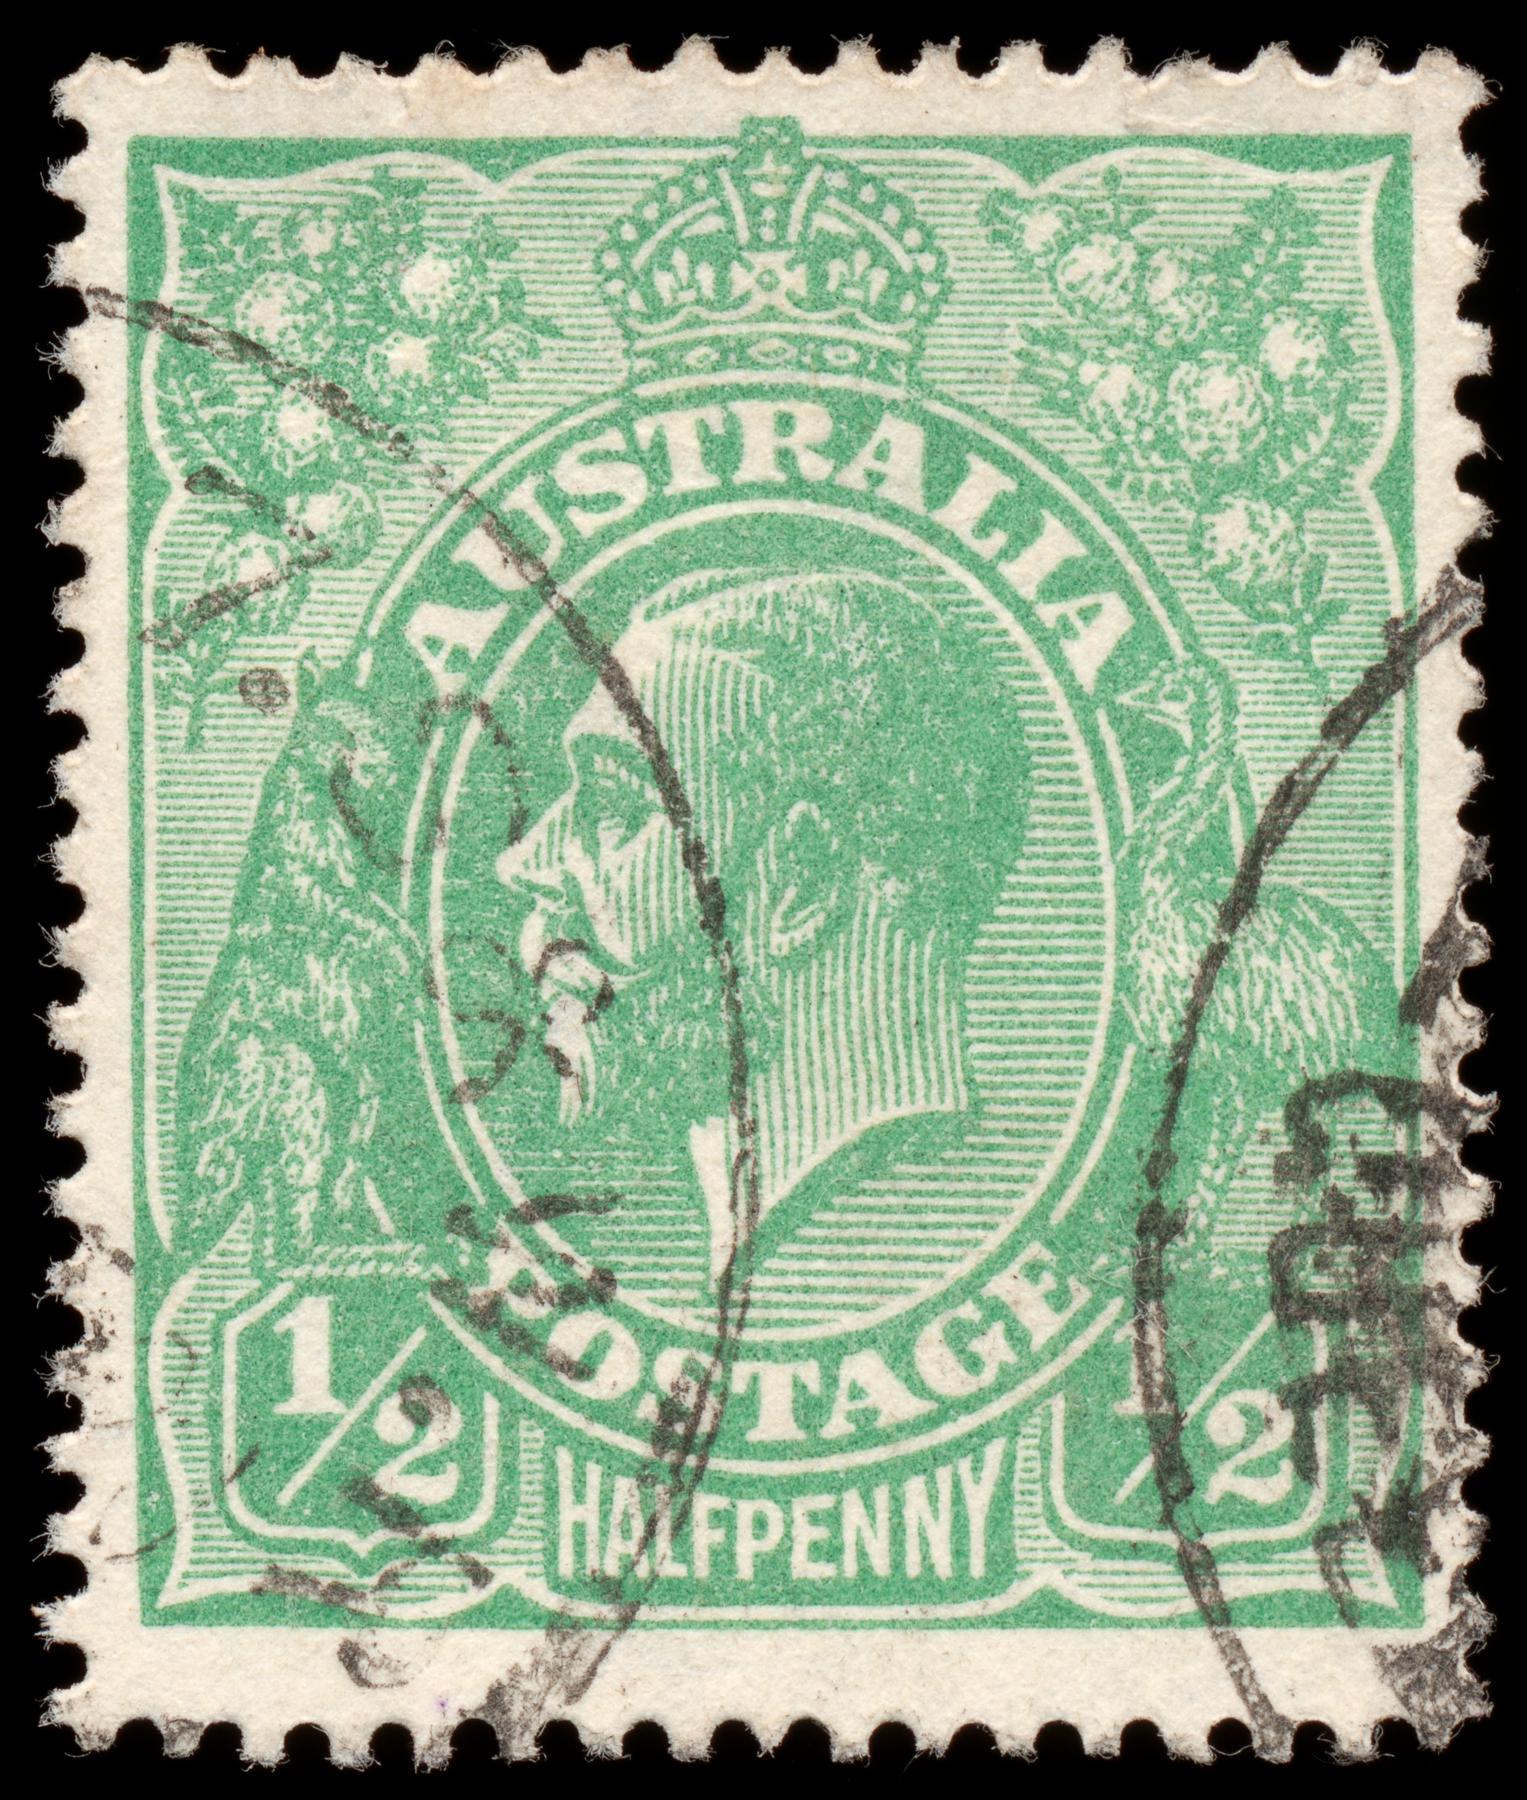 Green king george v stamp photo